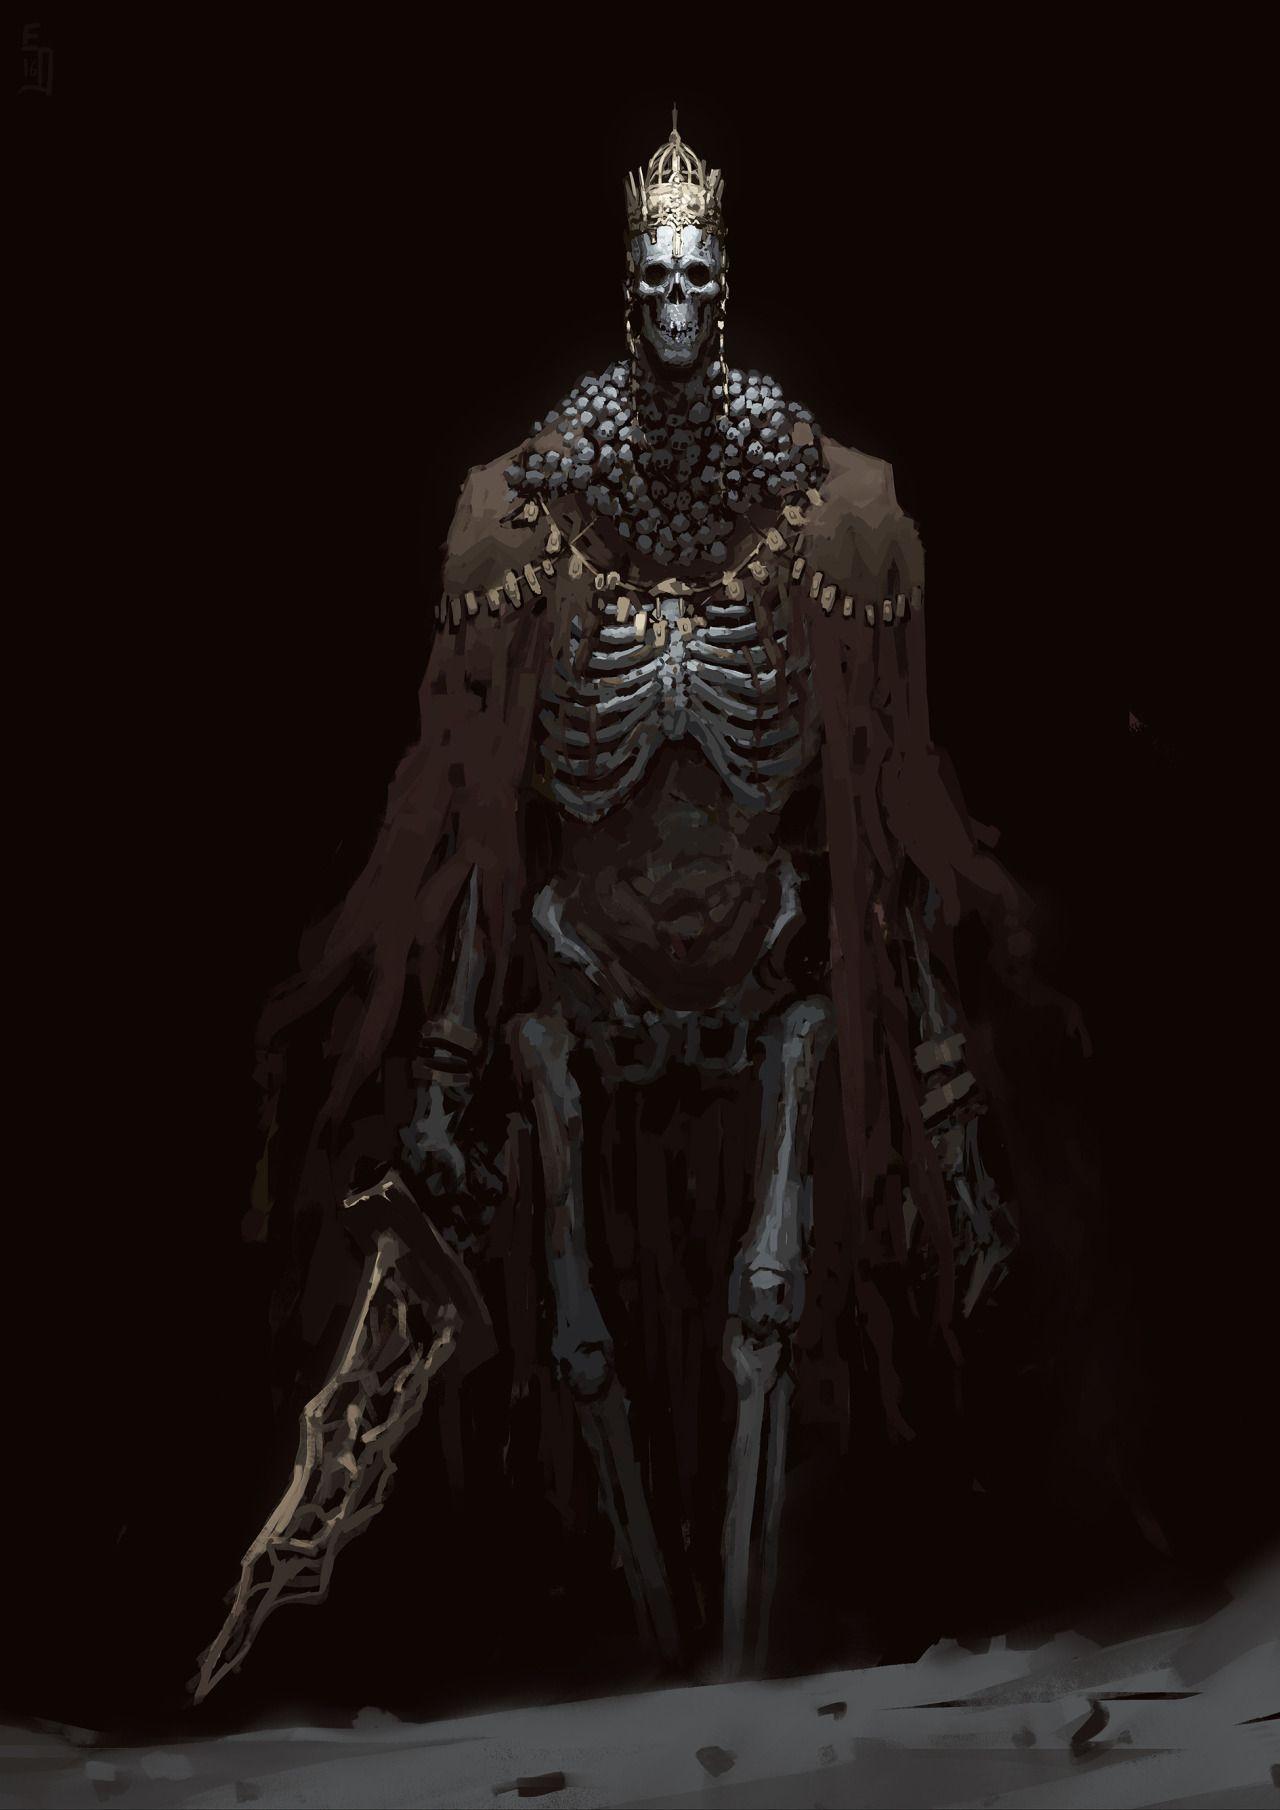 Undead King by Edward Delandre Creature Ideas